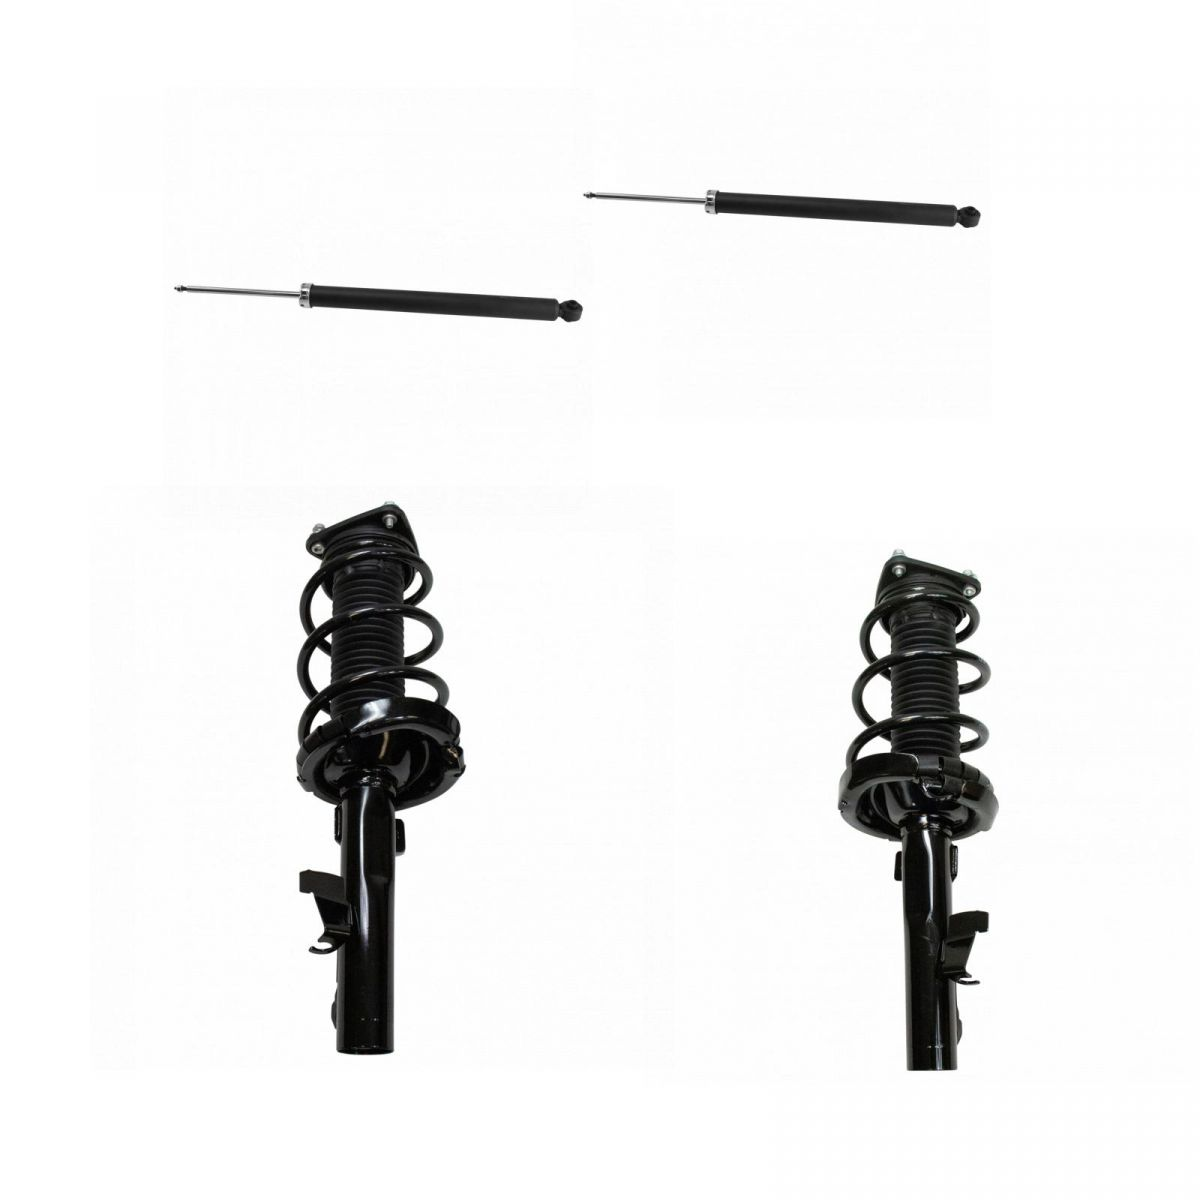 Complete Loaded Strut Spring Front Rear Absorber Kit 4pc